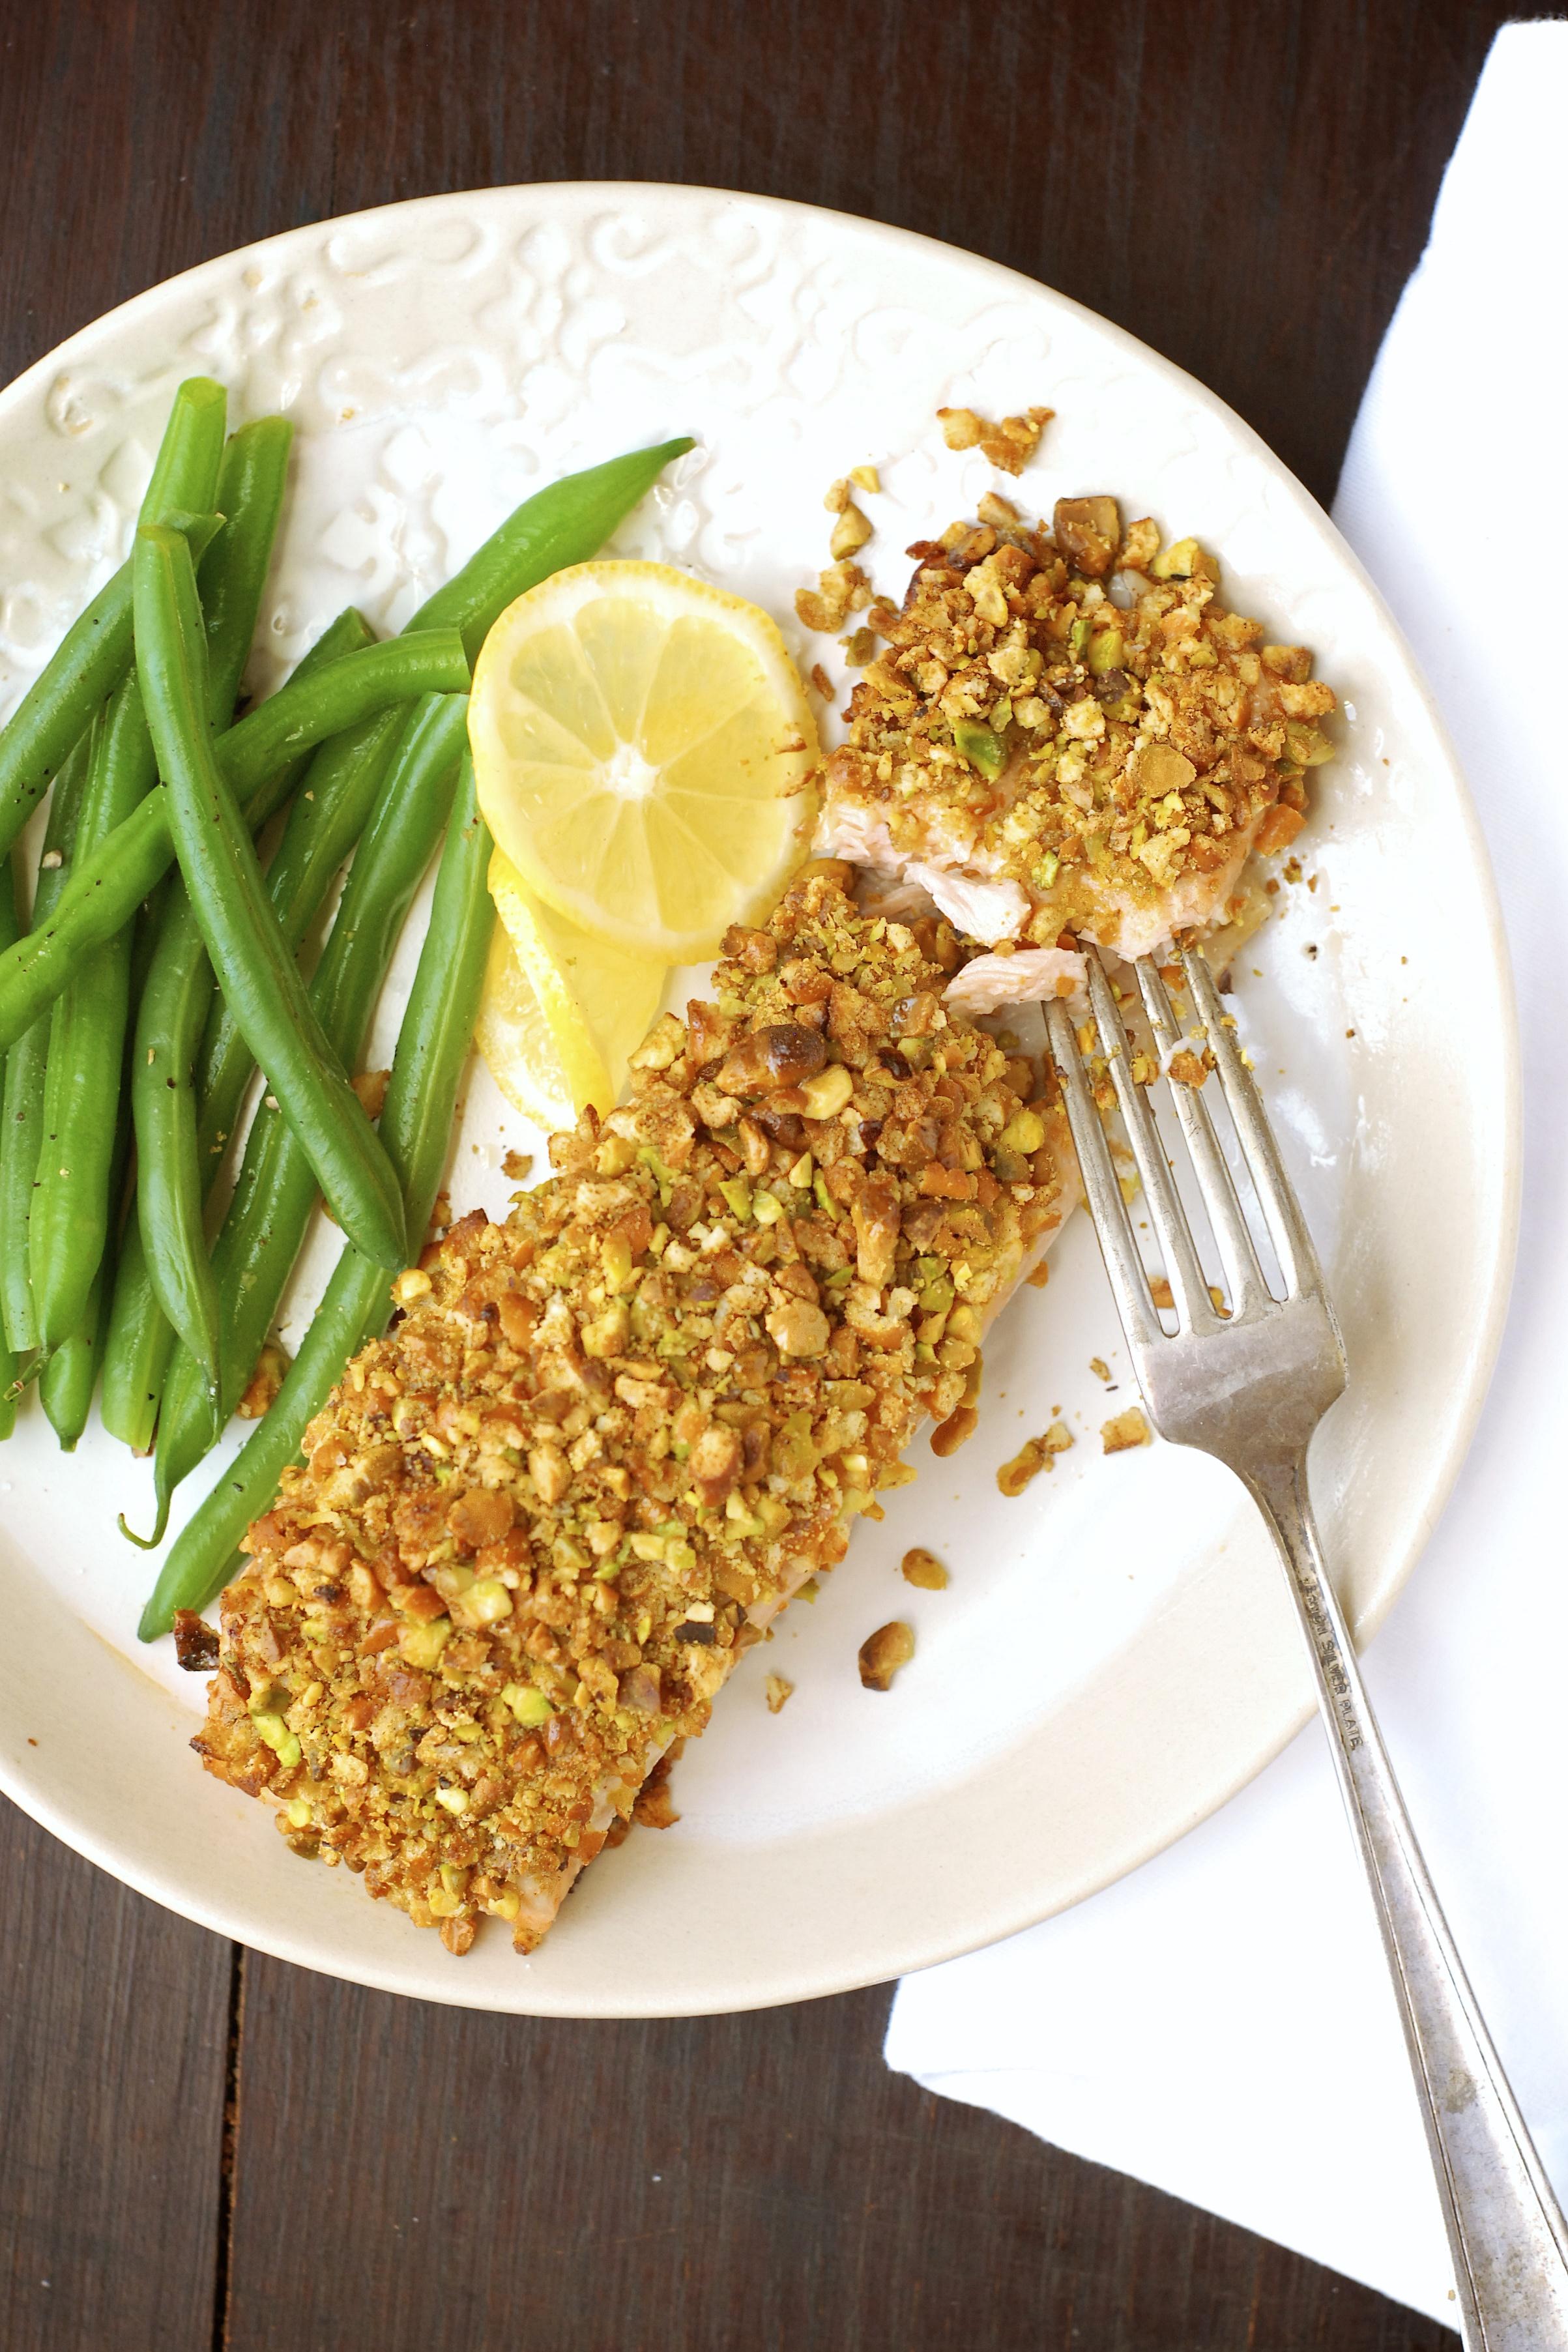 Honey-Mustard Pretzel & Pistachio Crusted Salmon